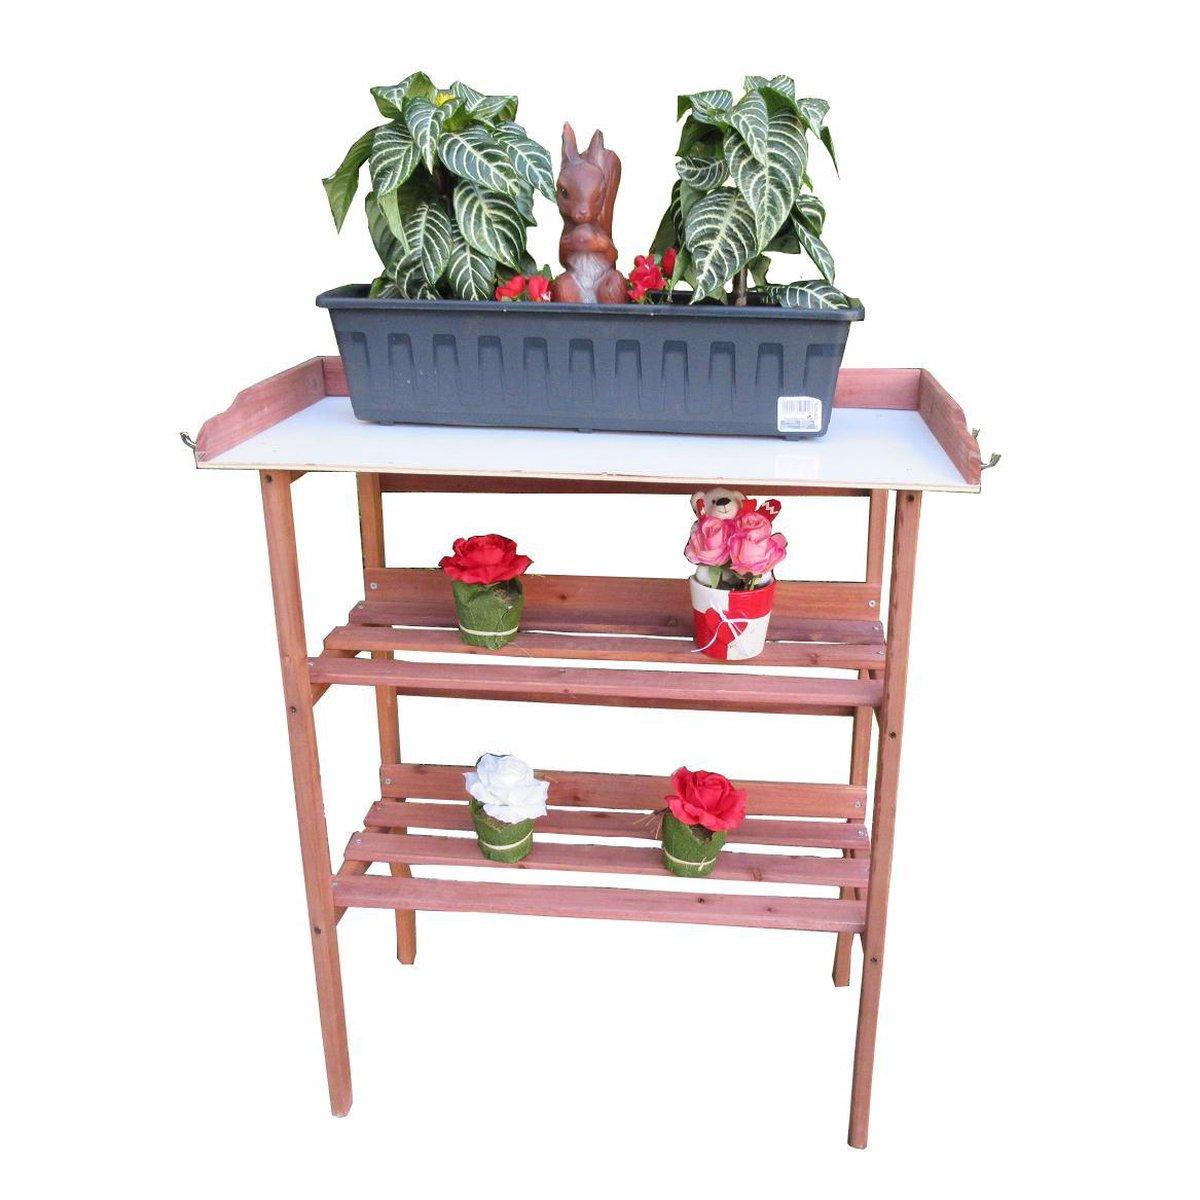 MaxxGarden Oppottafel - plantentafel - tuinwerktafel 80x40x86cm + GRATIS toebehorenset